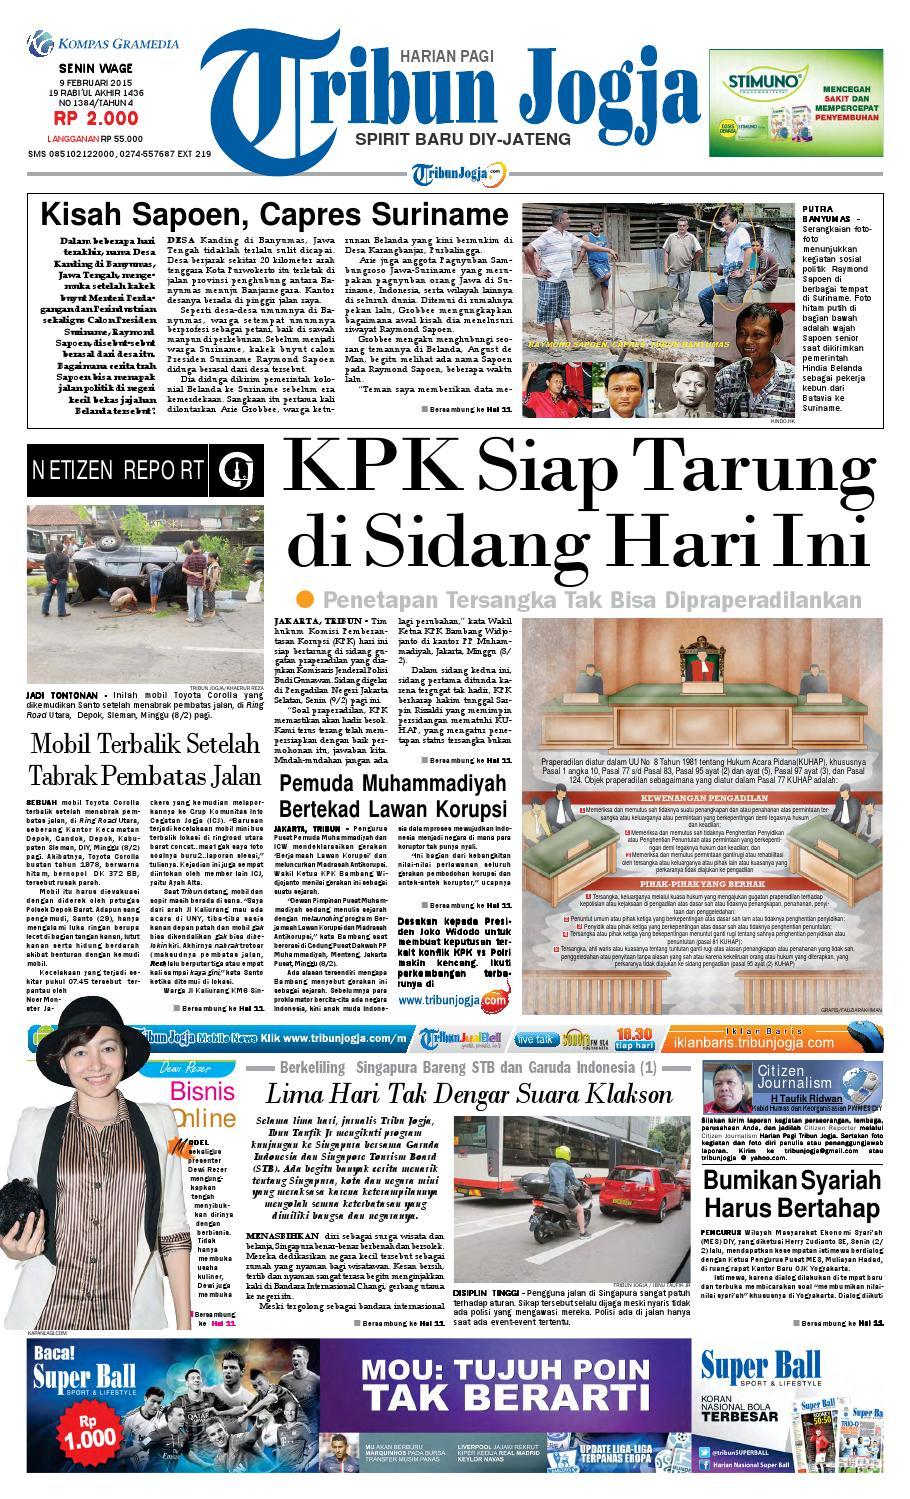 Tribunjogja 09 02 2015 By Tribun Jogja Issuu Produk Ukm Bumn Gula Jawa 1 2 Kg Free Ongkir Area Depok